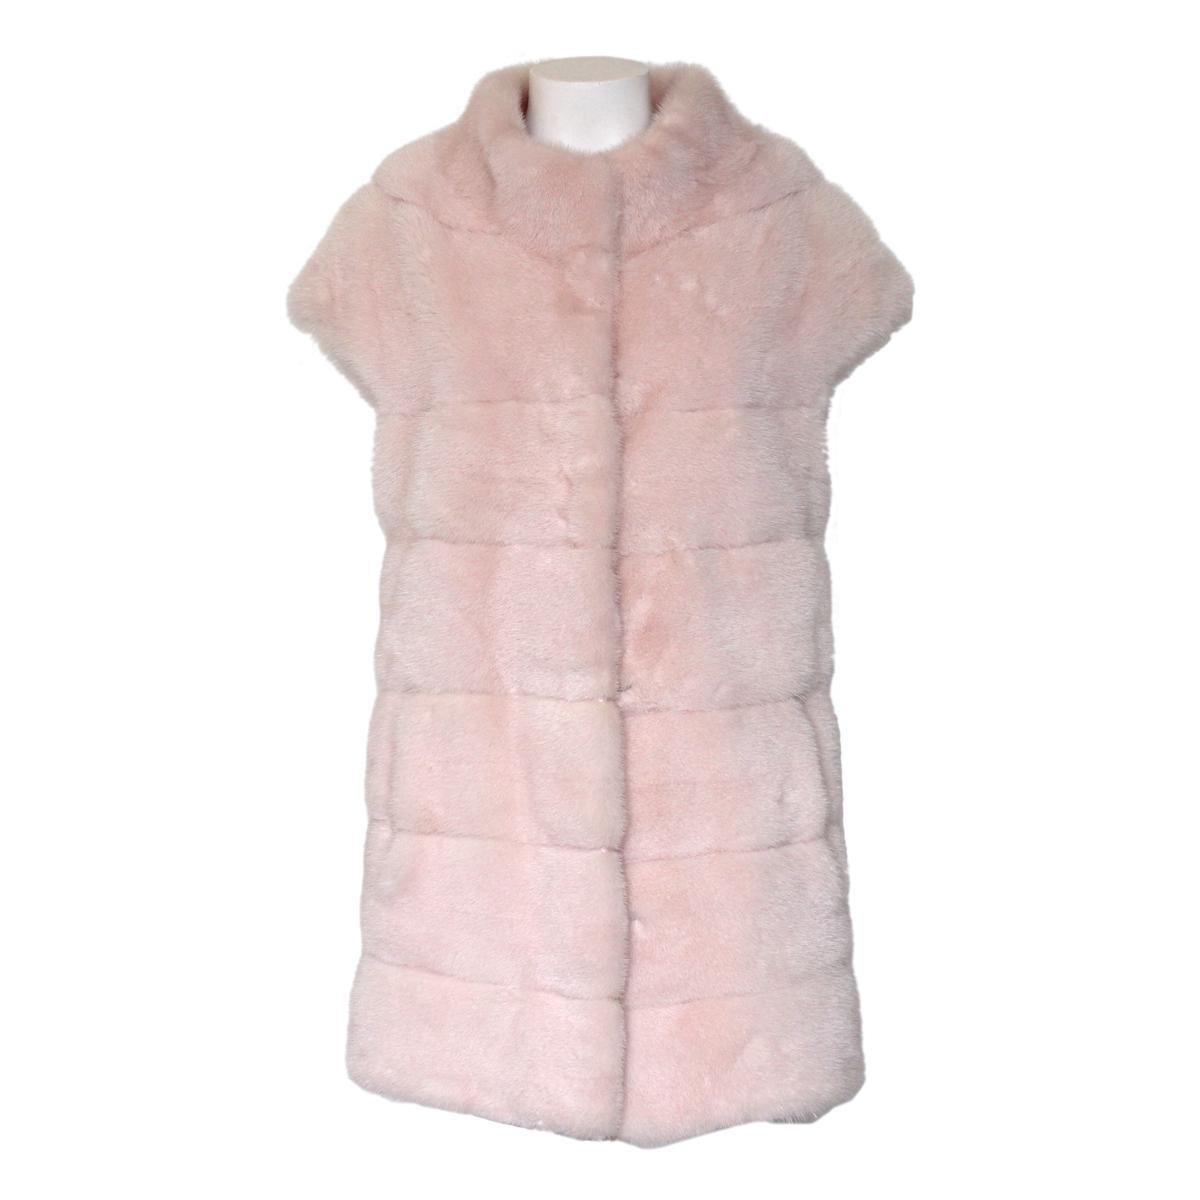 Pagano Porto Cervo Superior Pink Mink Vest